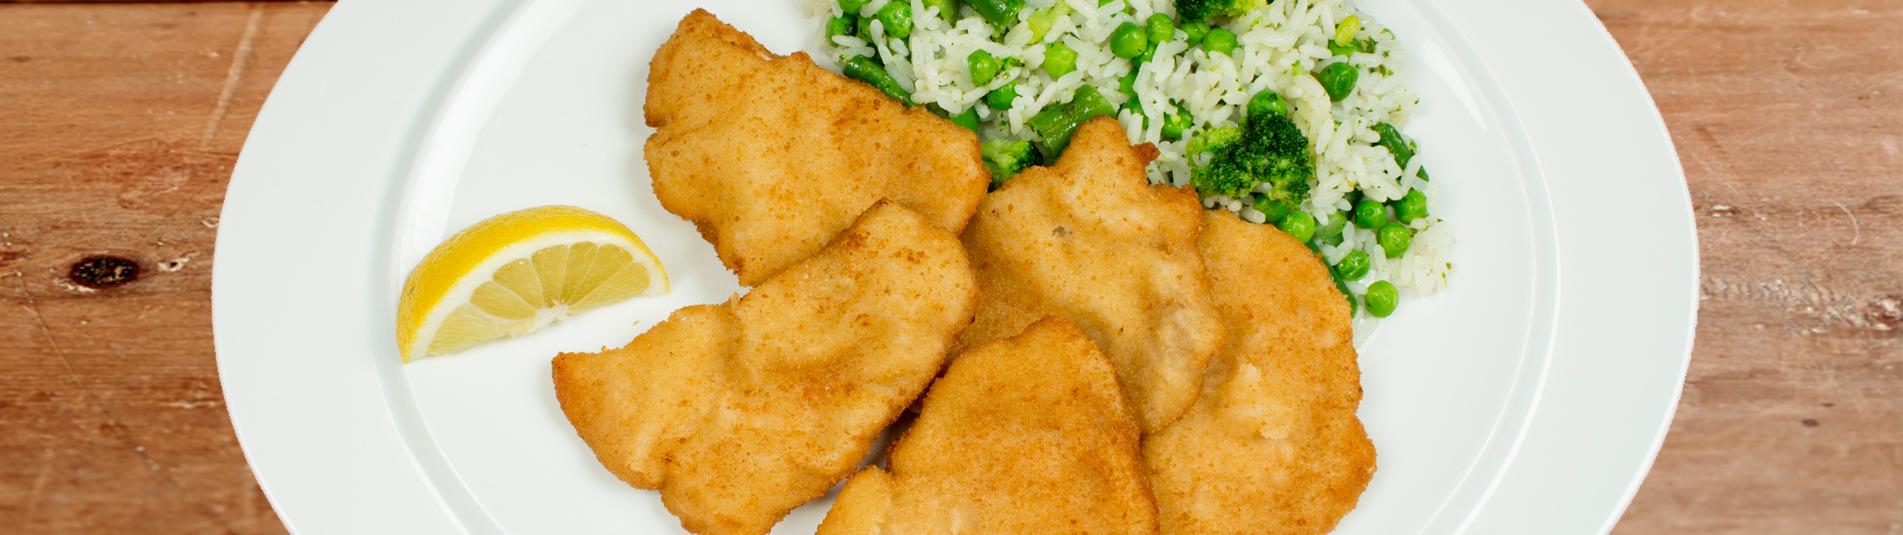 Iglo Schnitzel mit Gemüsereis Rezept